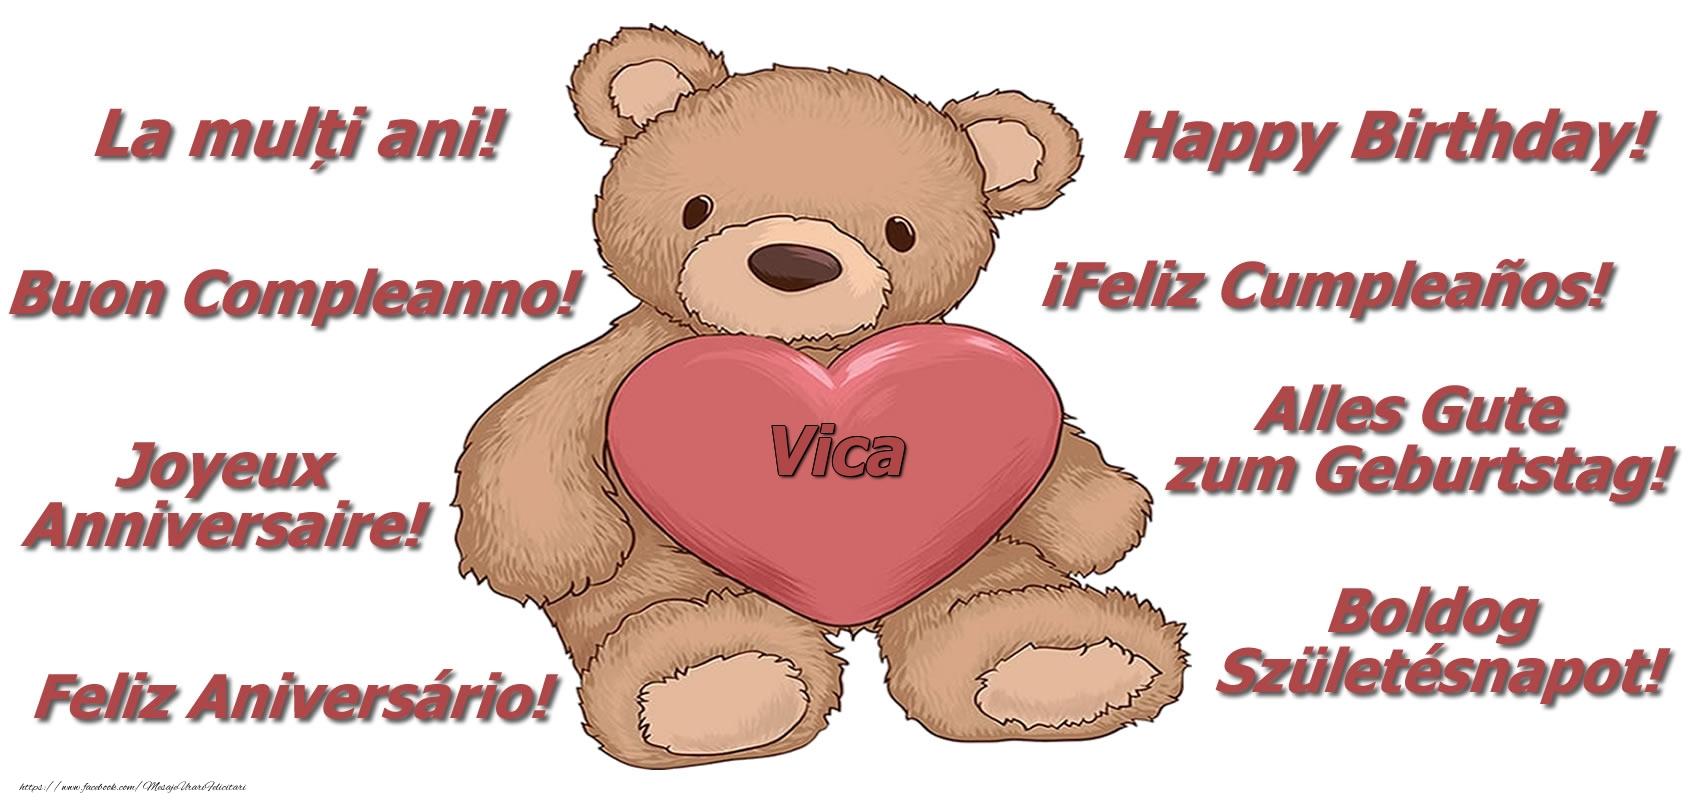 Felicitari de zi de nastere - La multi ani Vica! - Ursulet